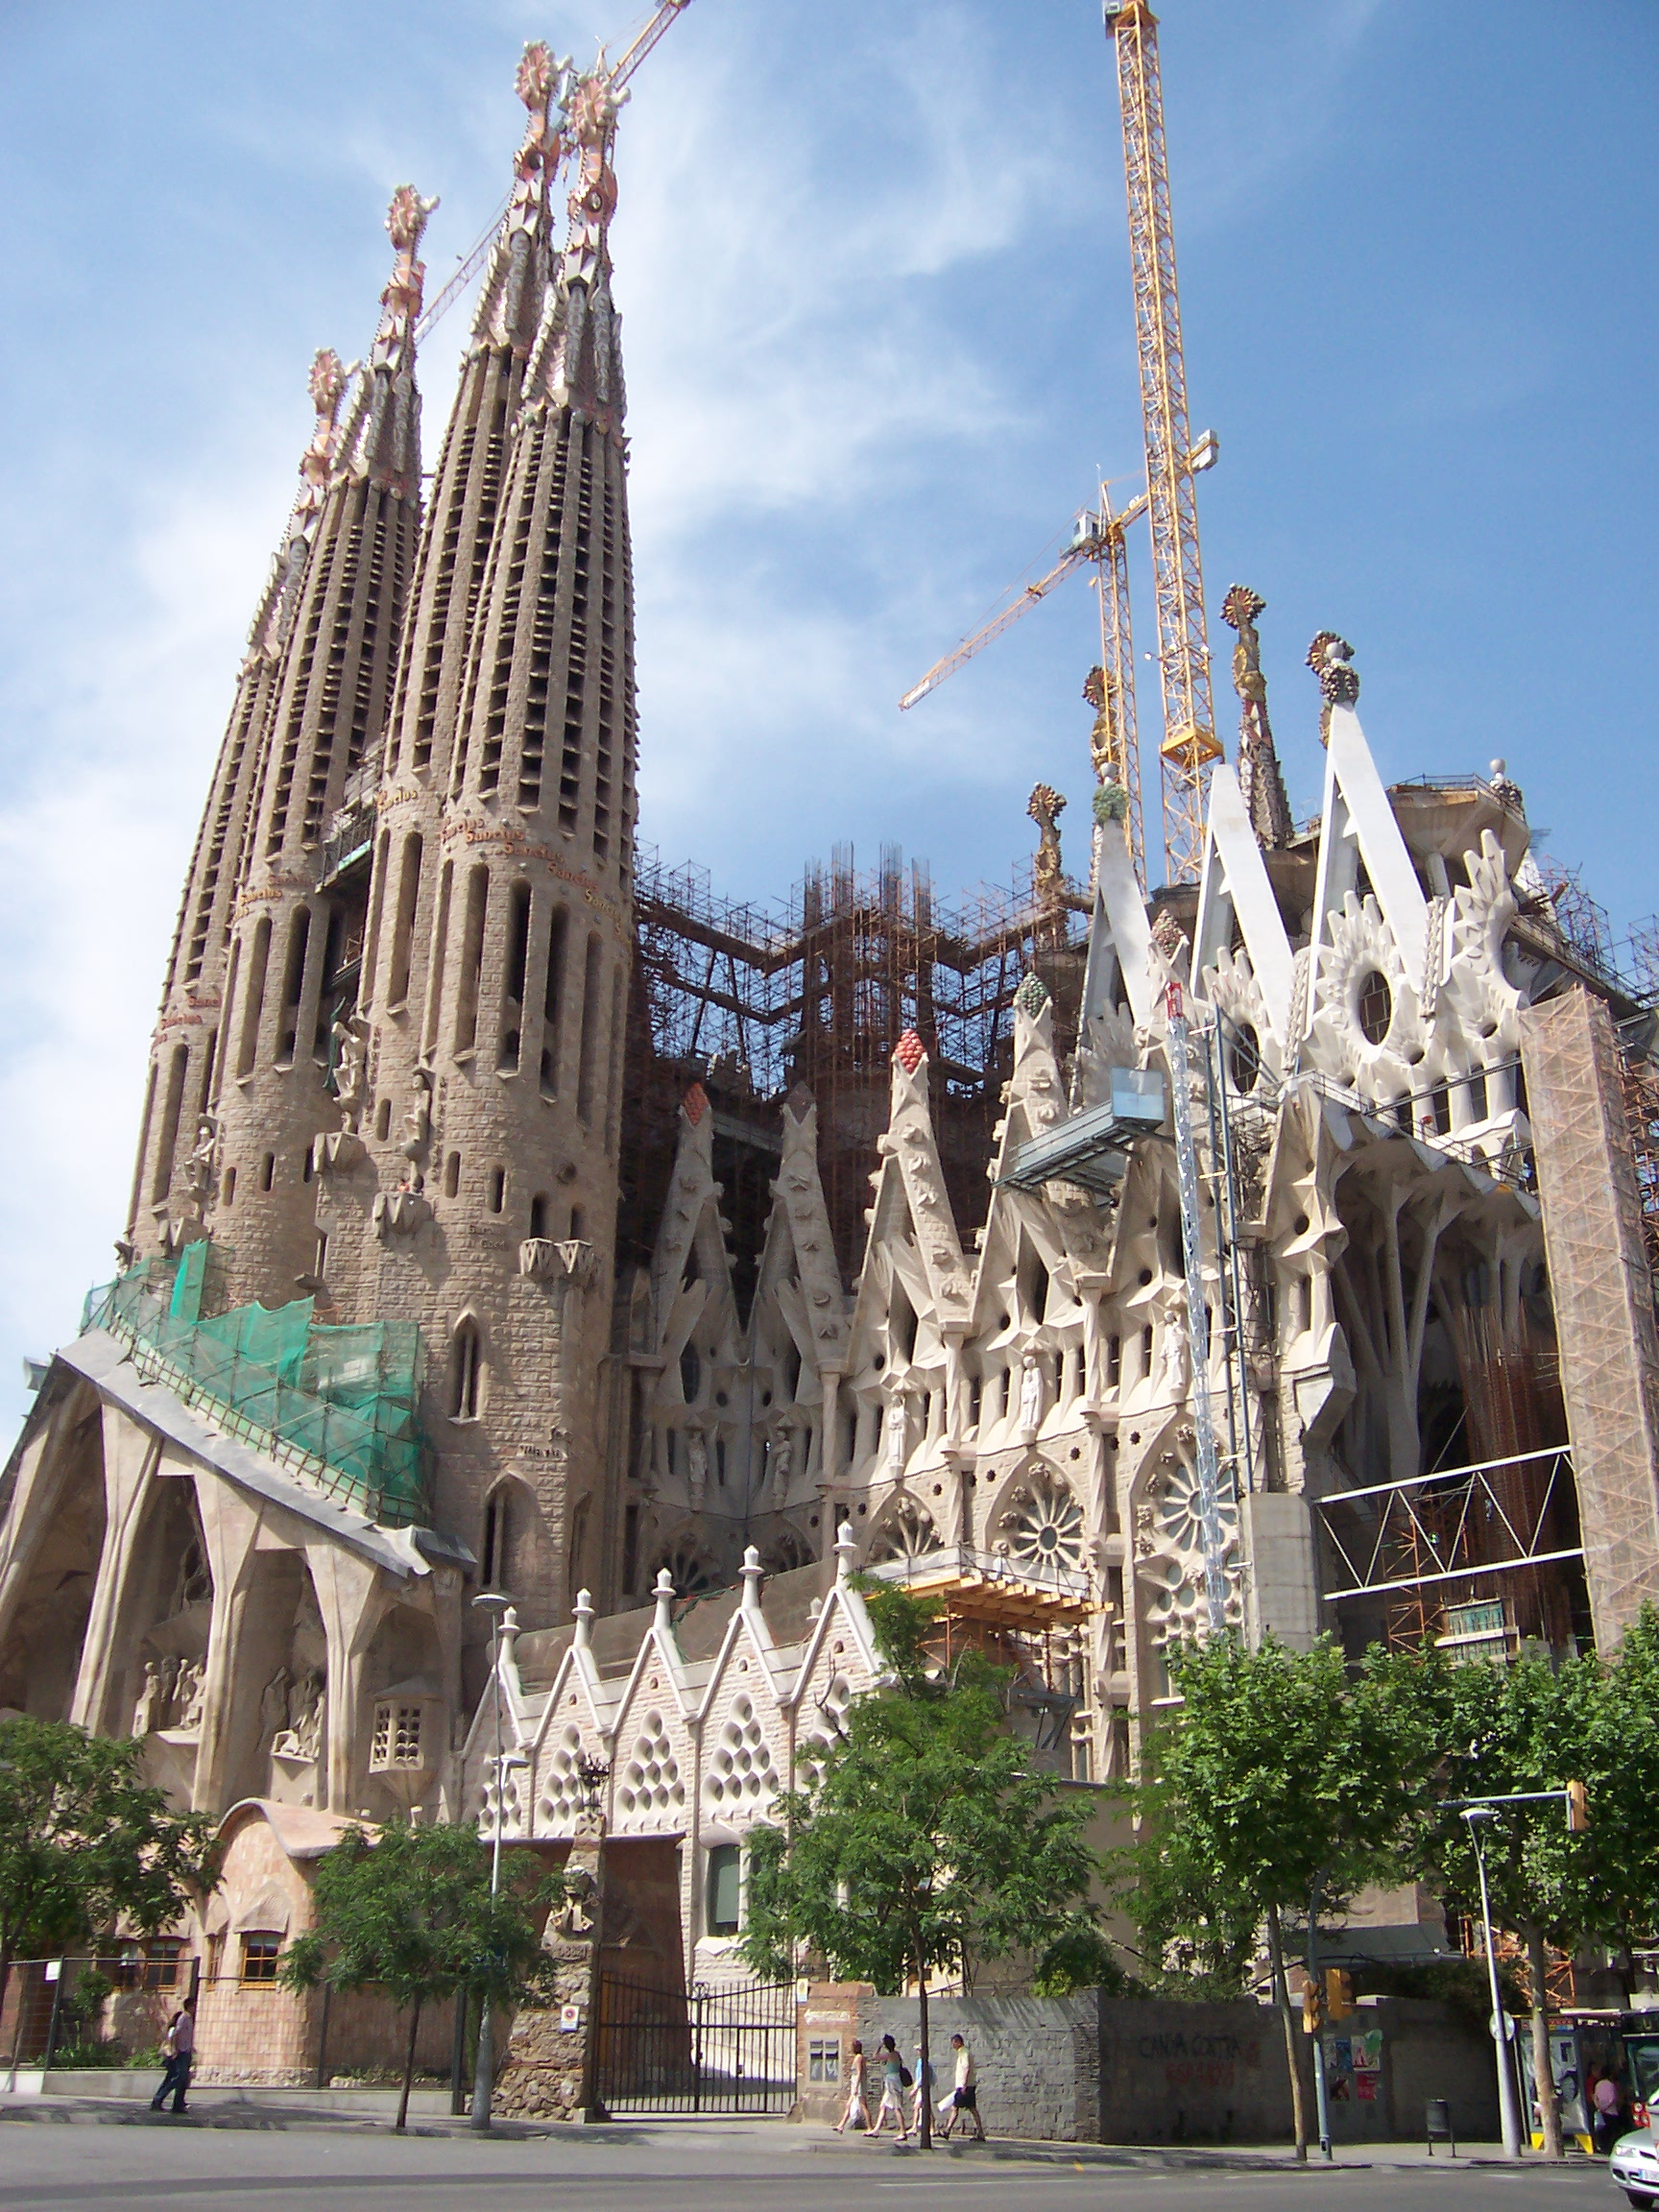 Lugares fant sticos as sete maravilhosas obras de gaud - Art nouveau architecture de barcelone revisitee ...